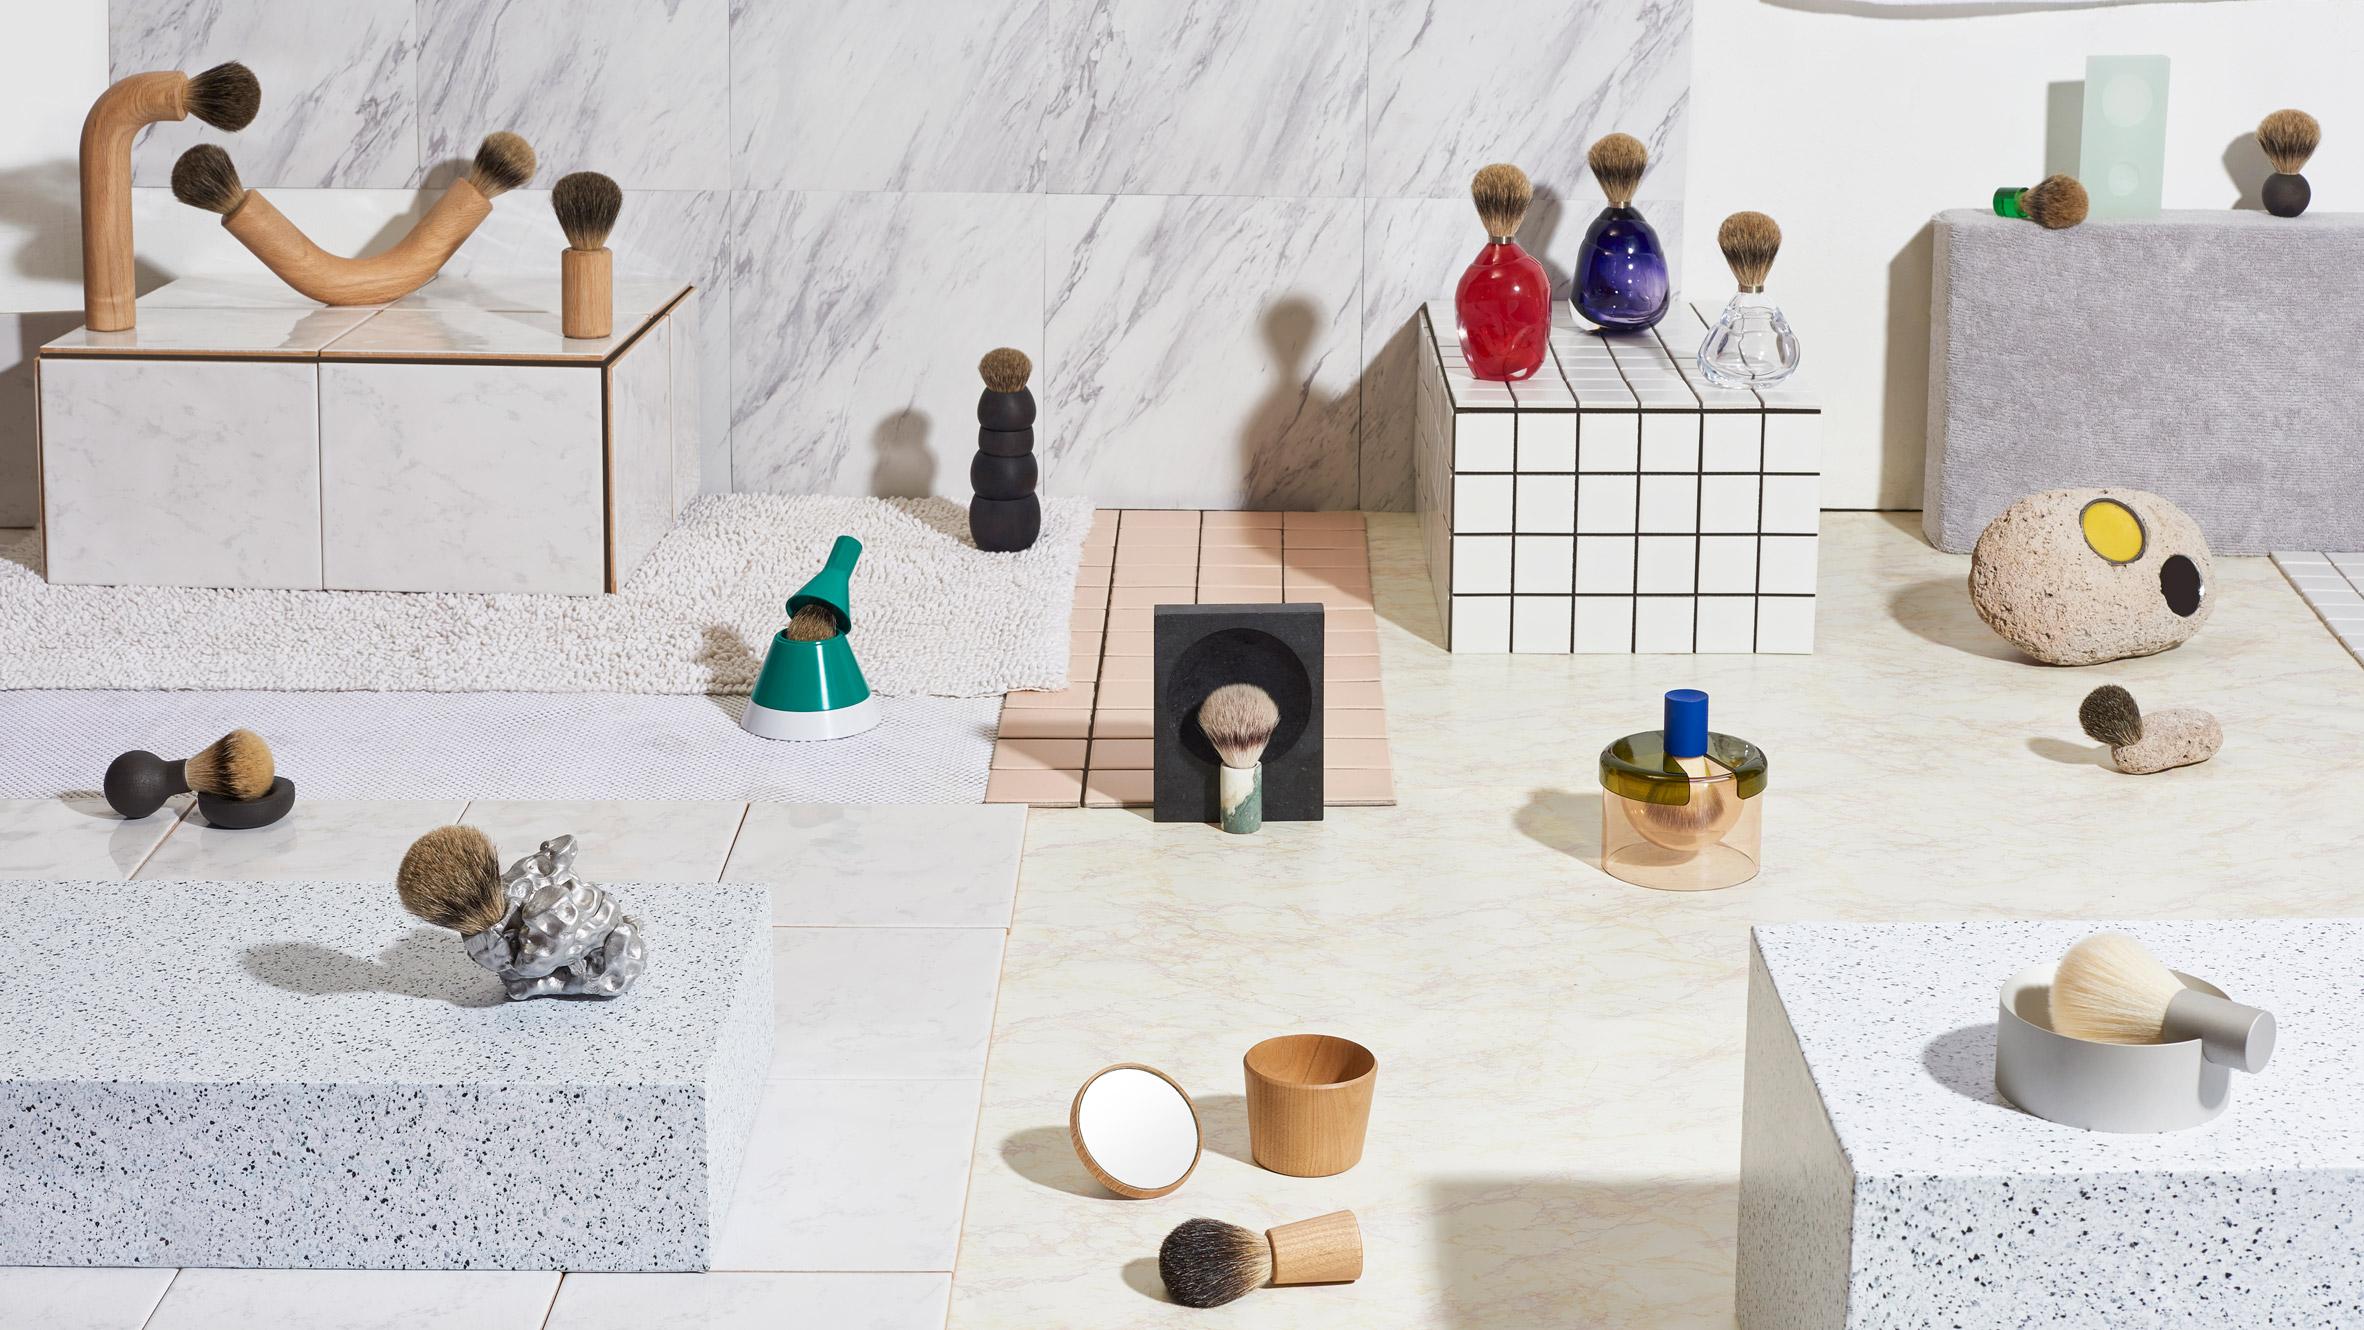 13 designers reimagine the shaving brush for Good Thing collection Good-thing-harrys-shaving-brushes-new-york-2017-design-products_dezeen_hero-1